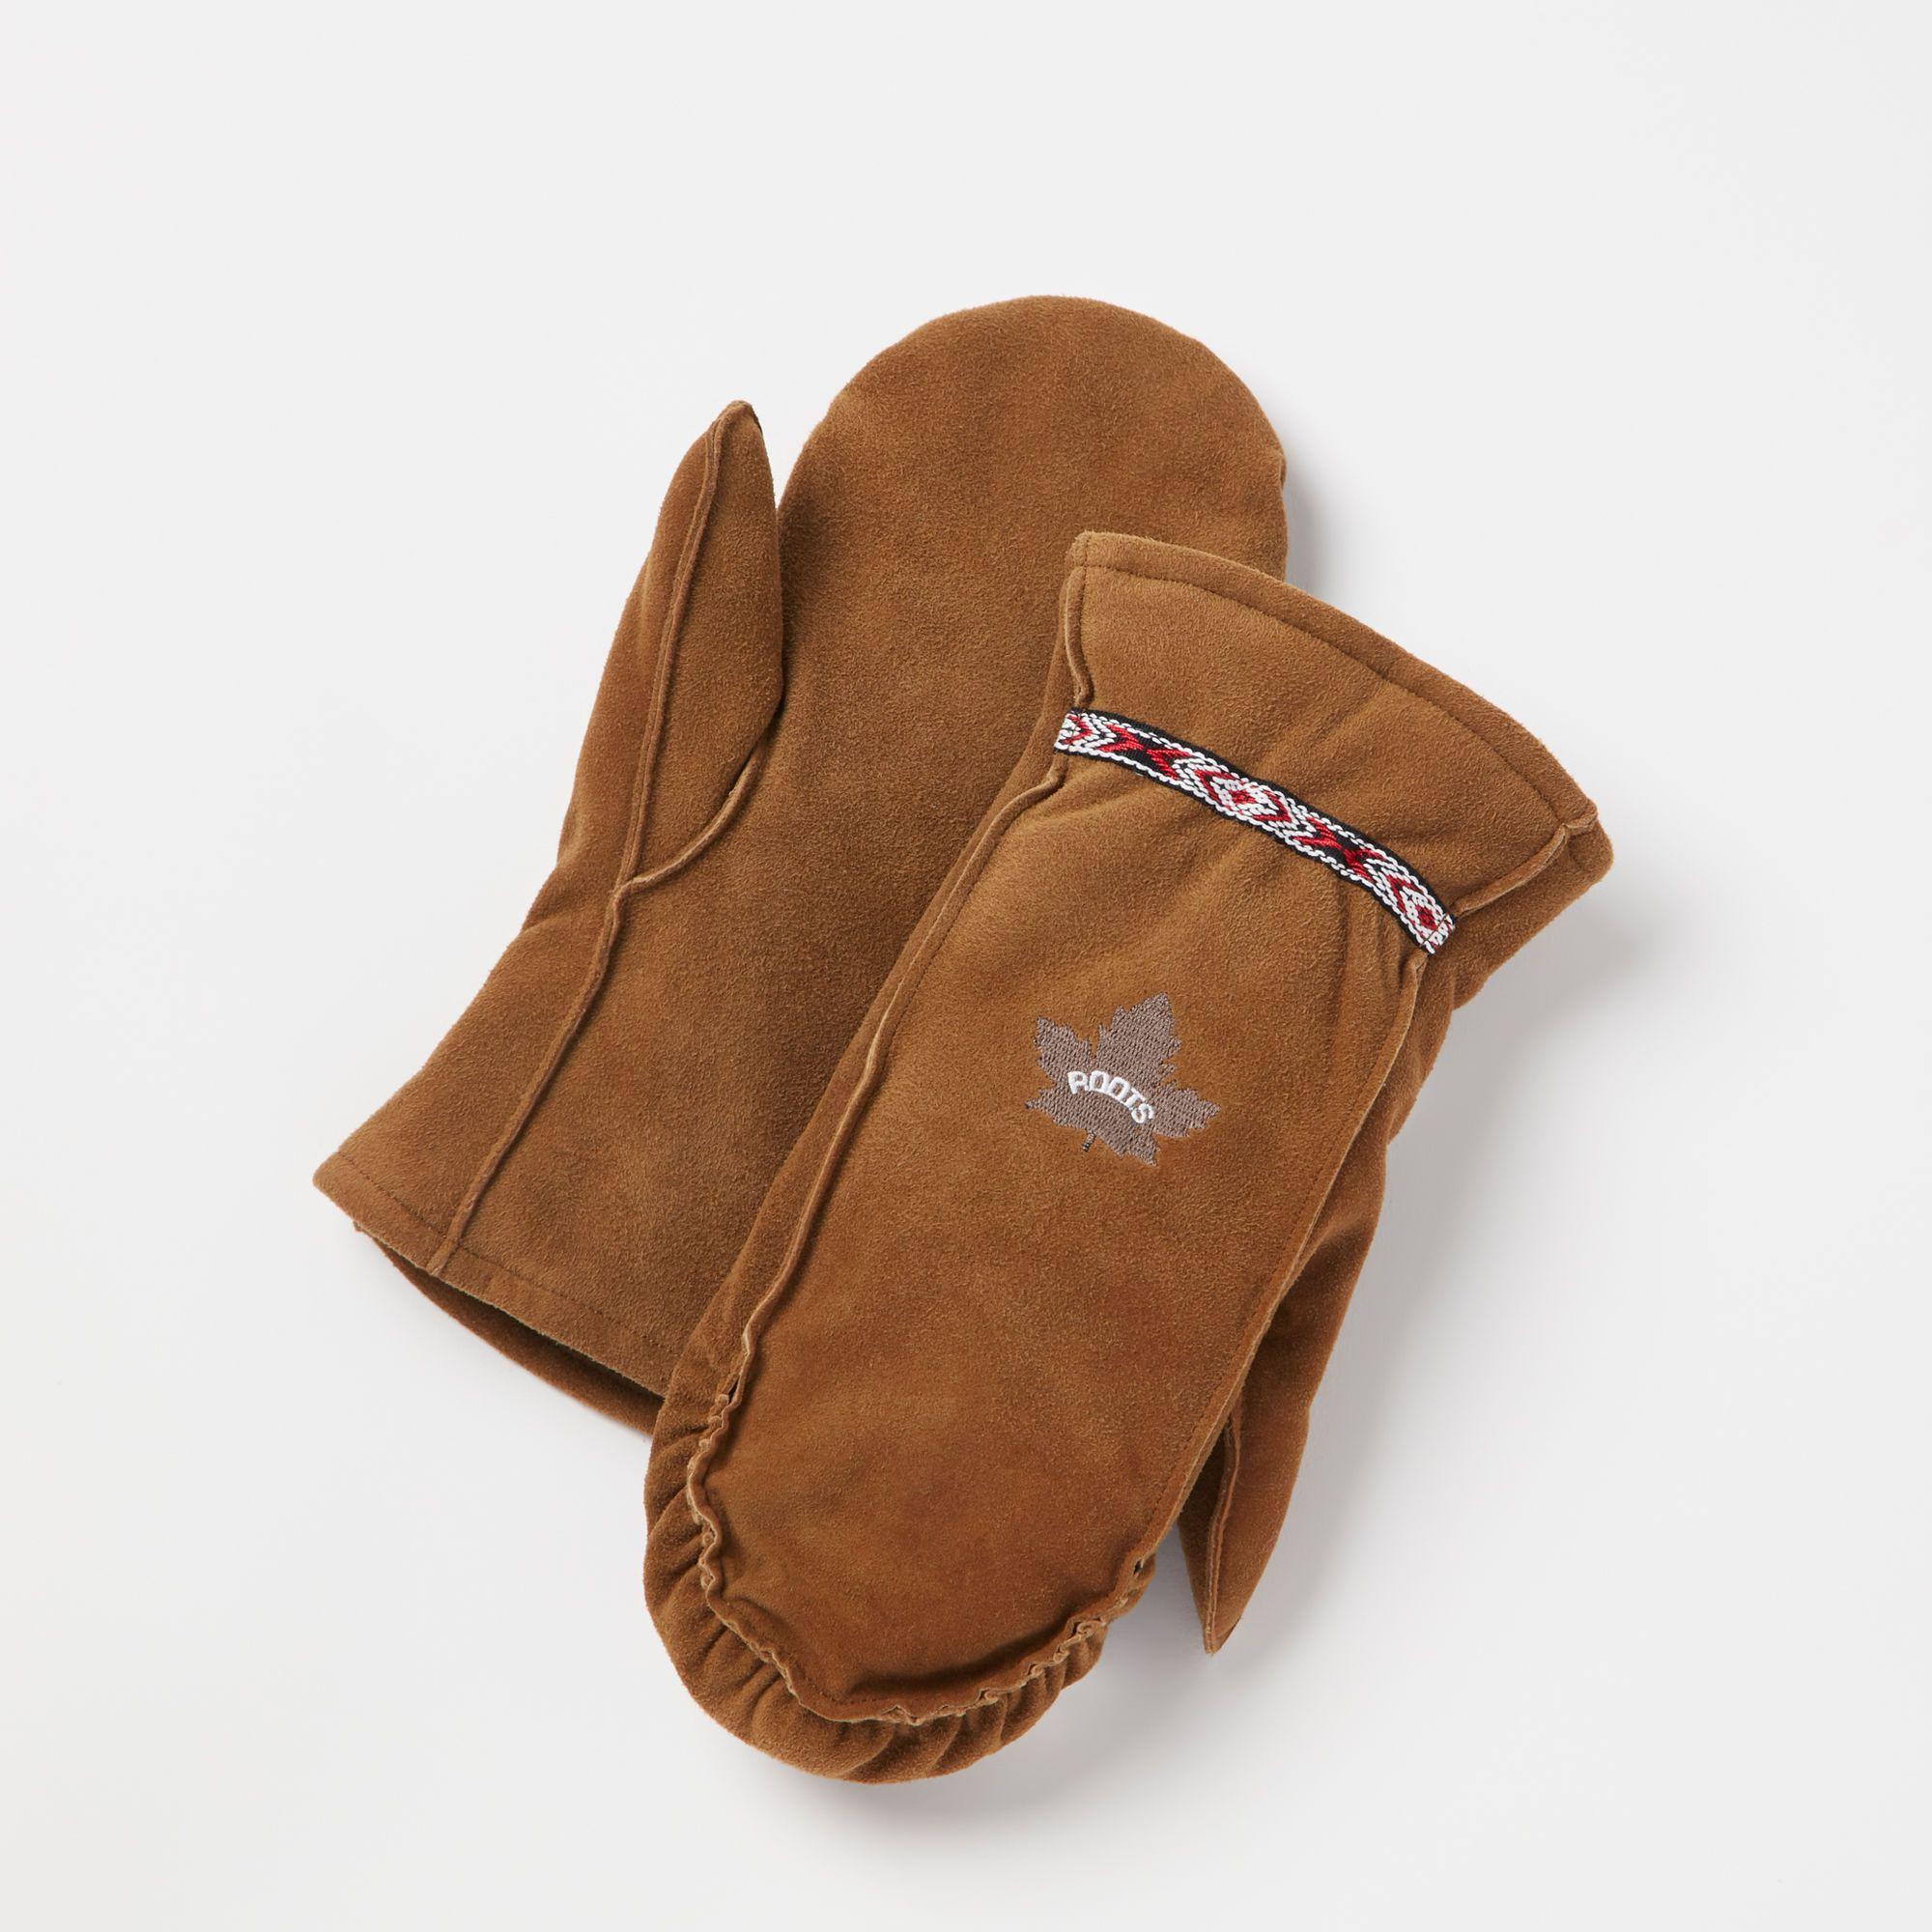 www.roots.com ca en moosonee-glove-mitt-14030499.html?cgid=womensGloves&start=7&selectedColor=Y24